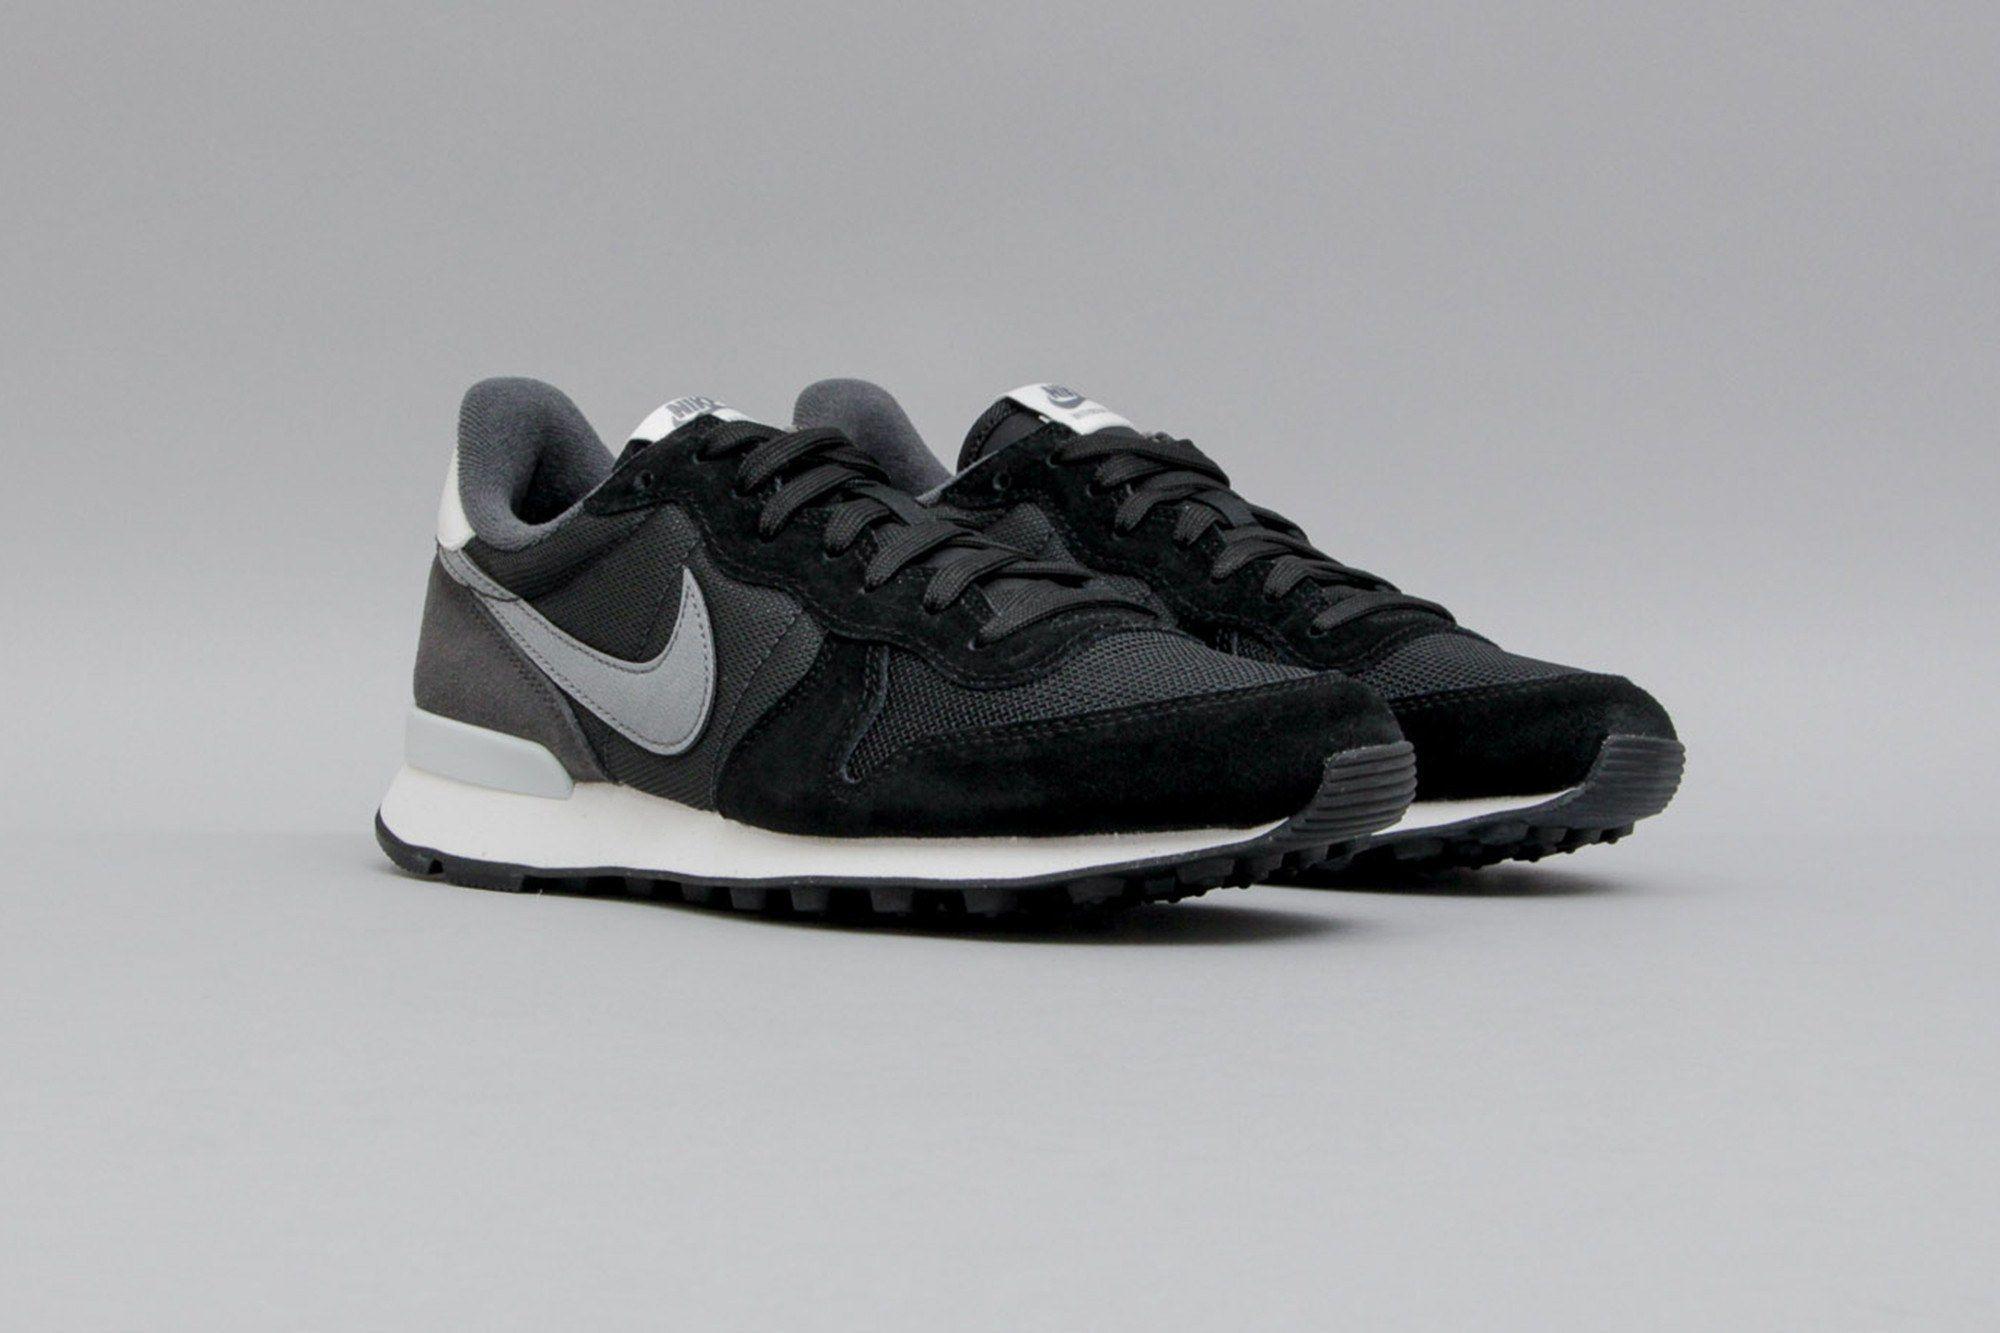 hot sale online 3d772 c2cfe Nike Wmns Internationalist Black Cool Grey Anthracite 828407 016 (Schwarz  Grau) from B V D S T